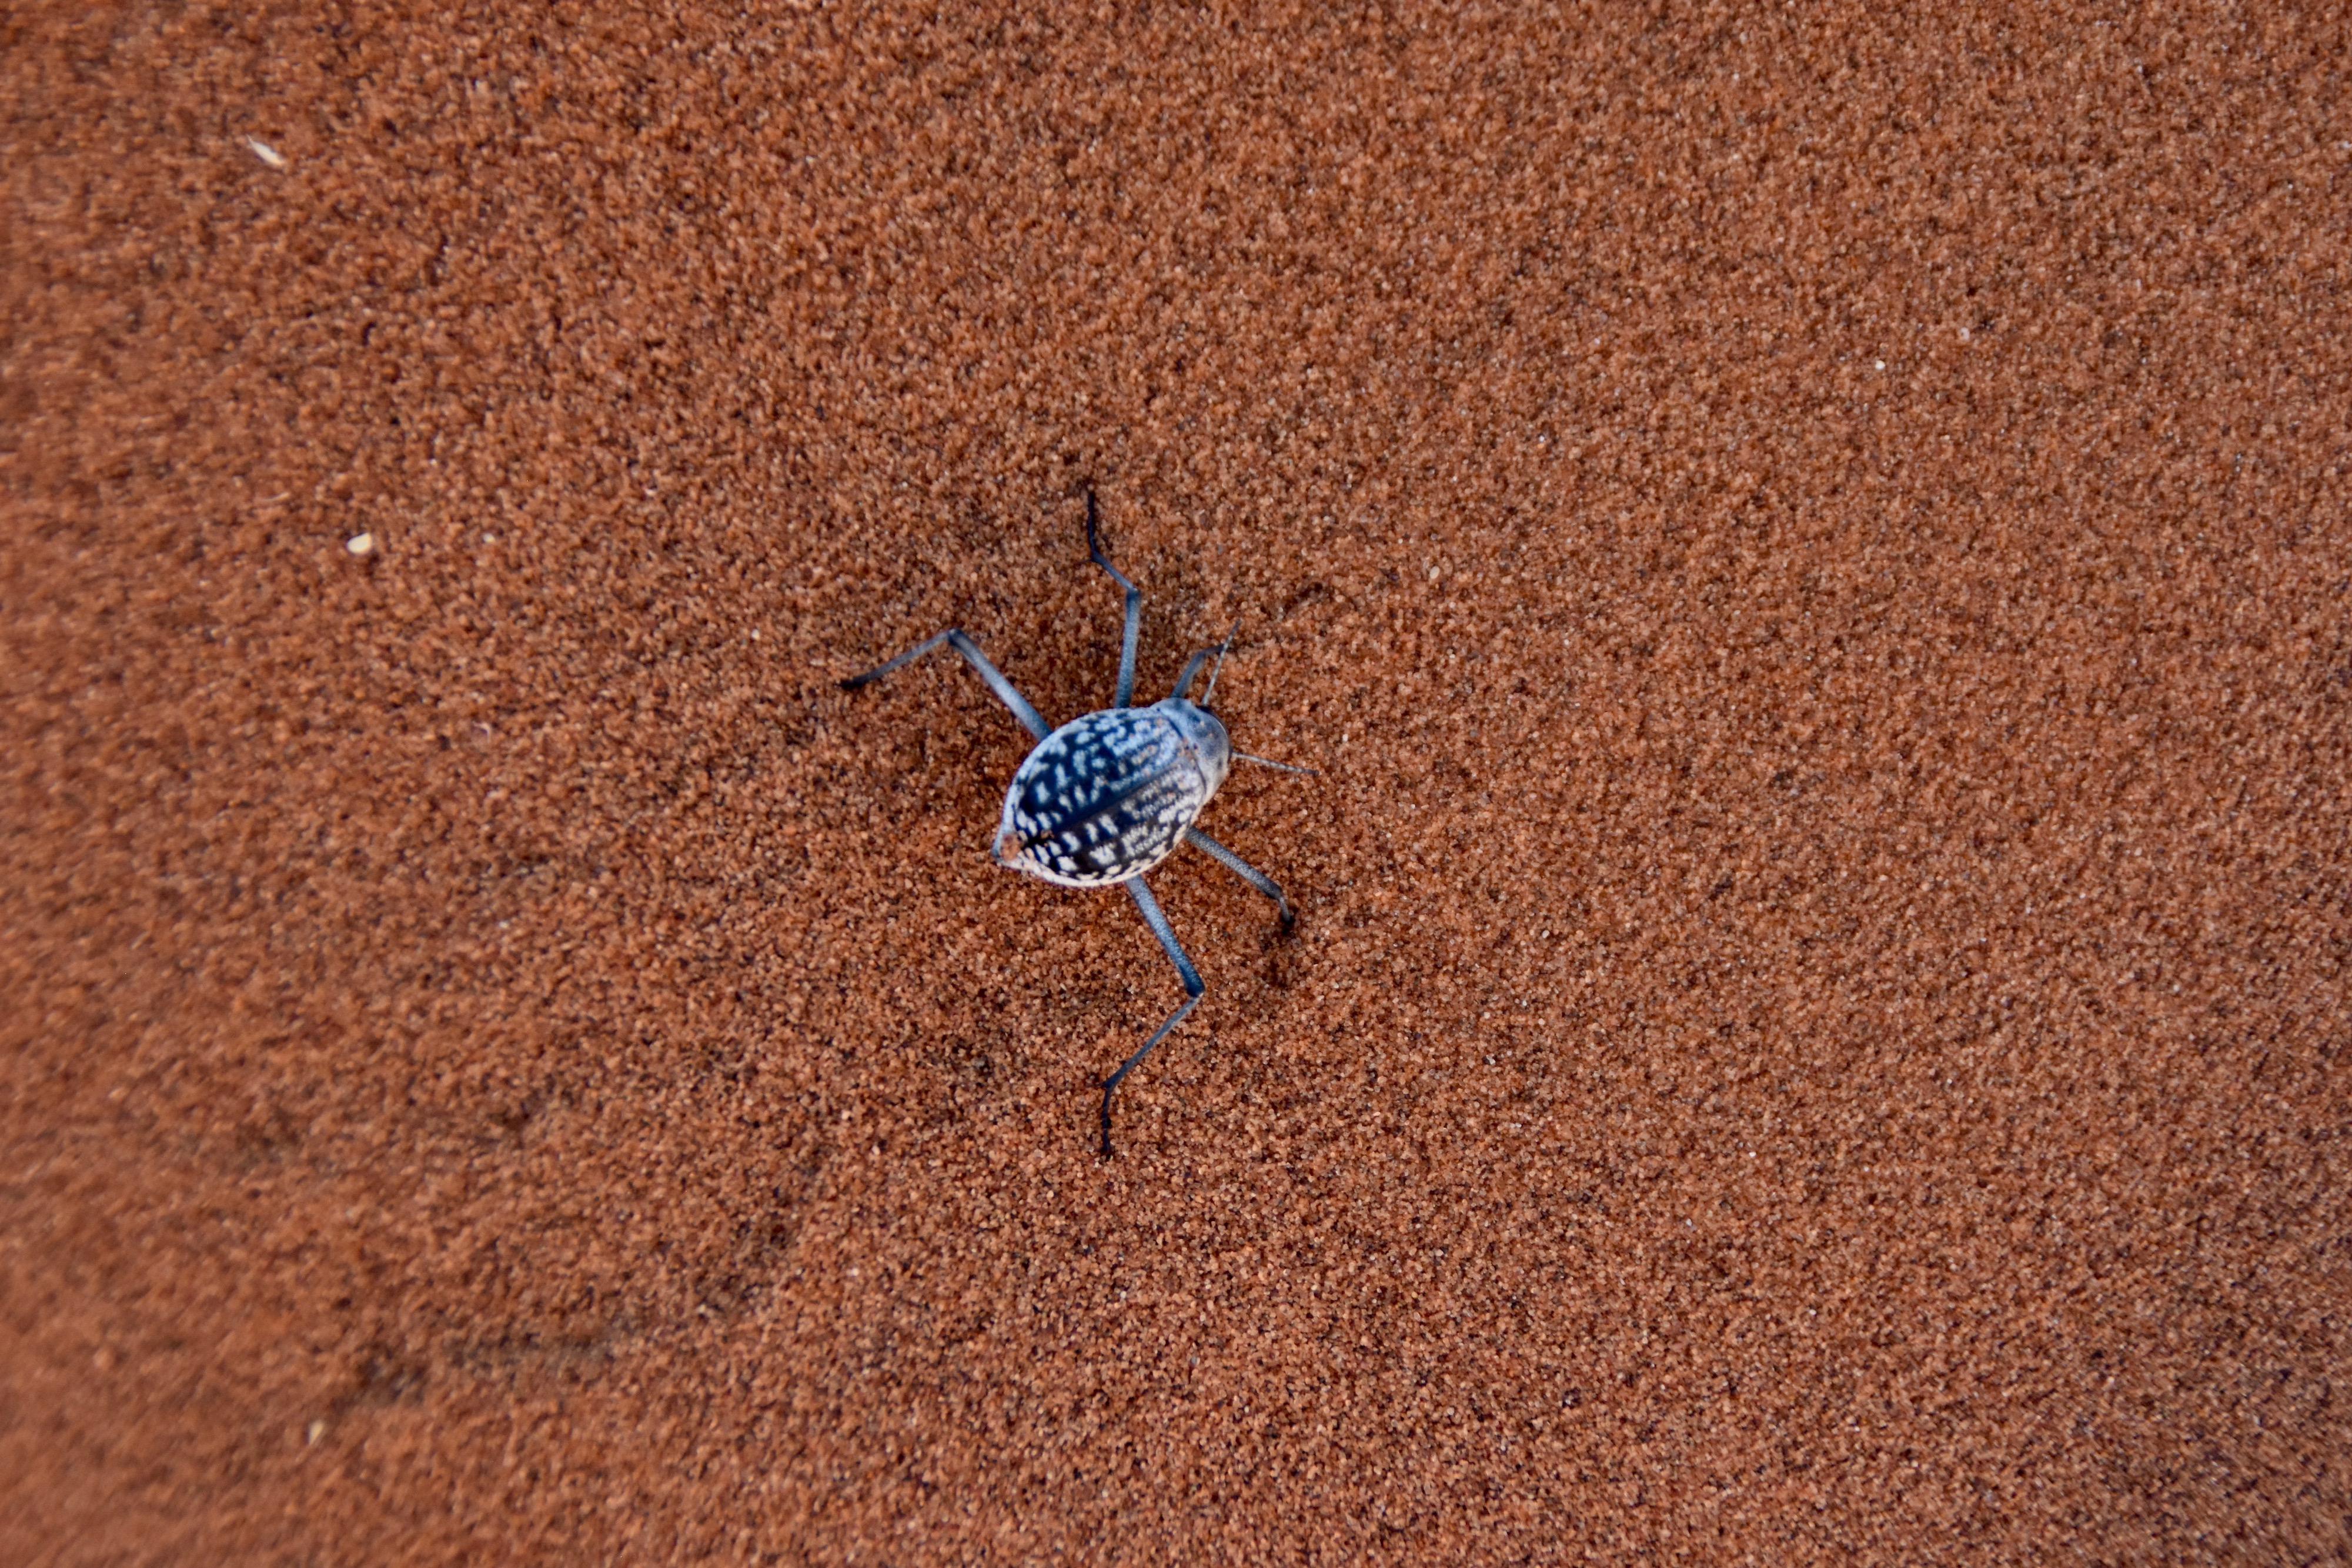 Darkling Beetle, Sossusvlei